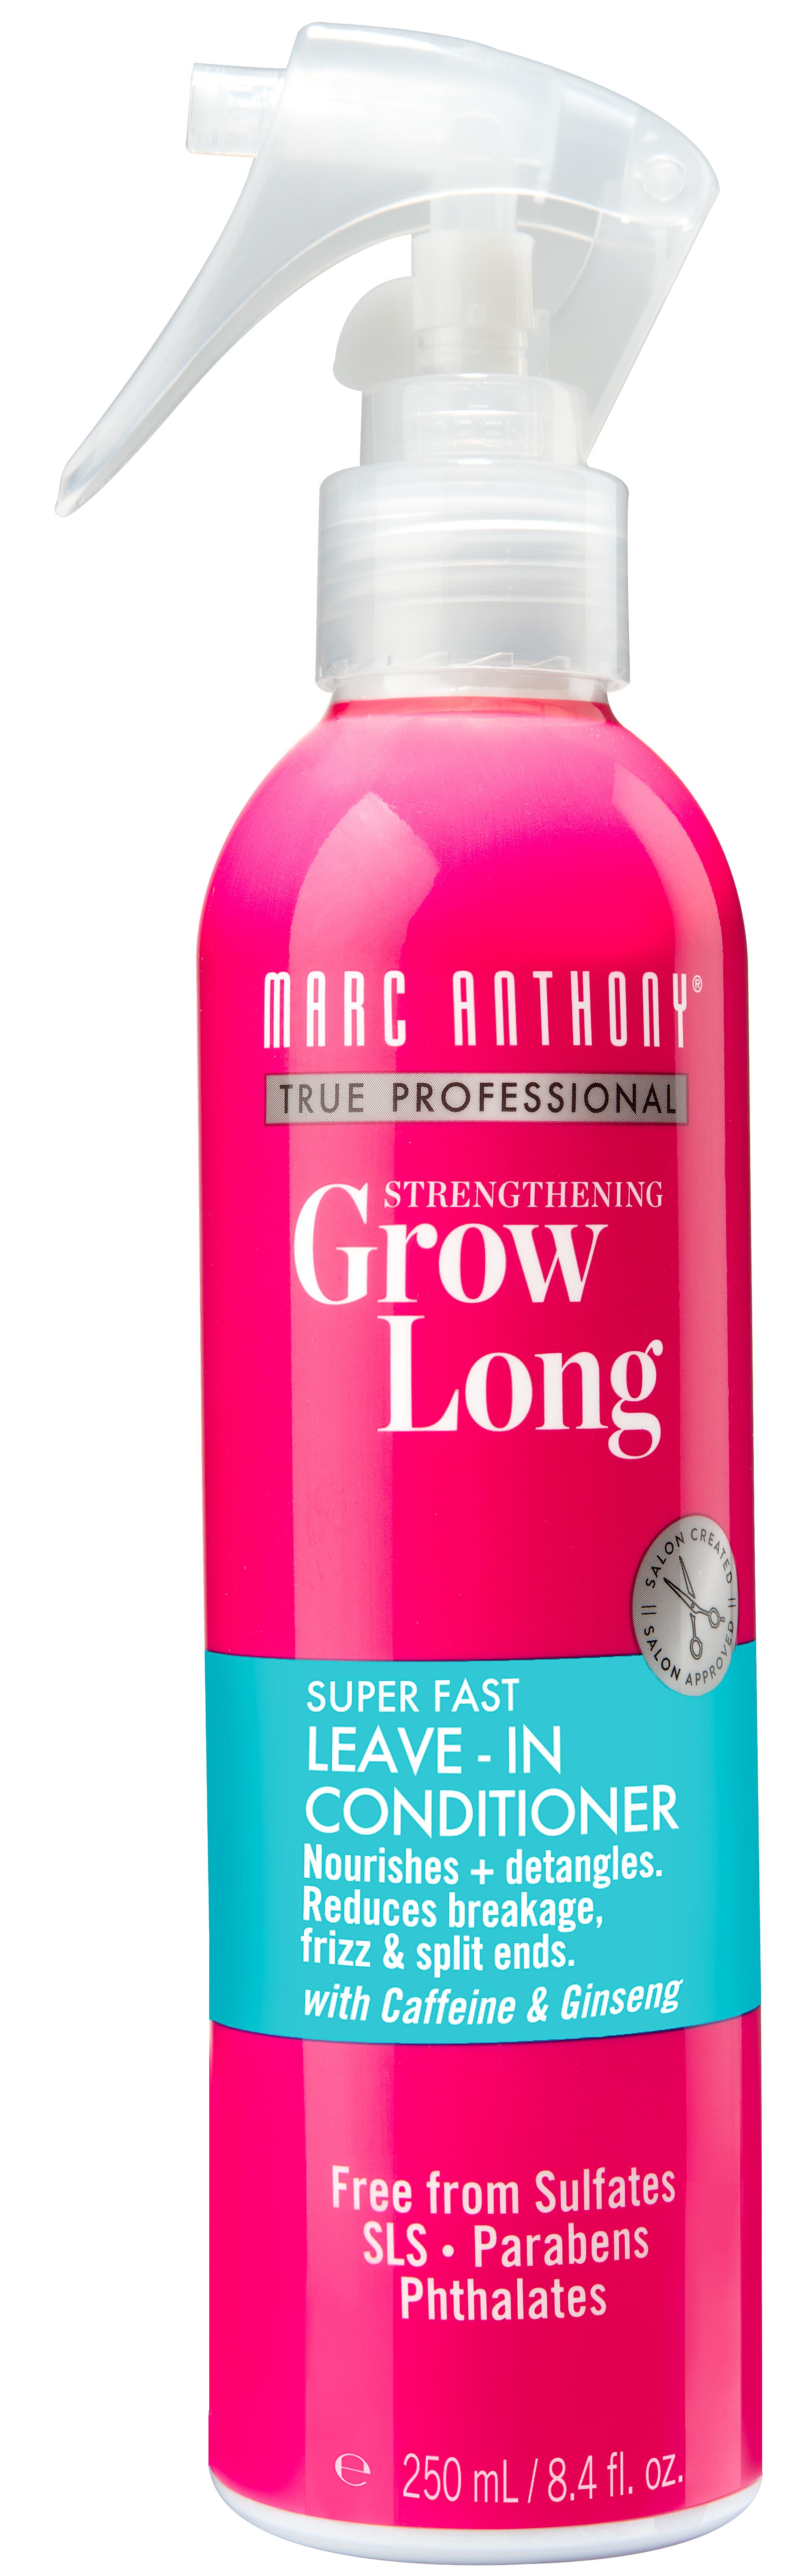 Grow Longer Caffein Ginseng Leave In 250ml